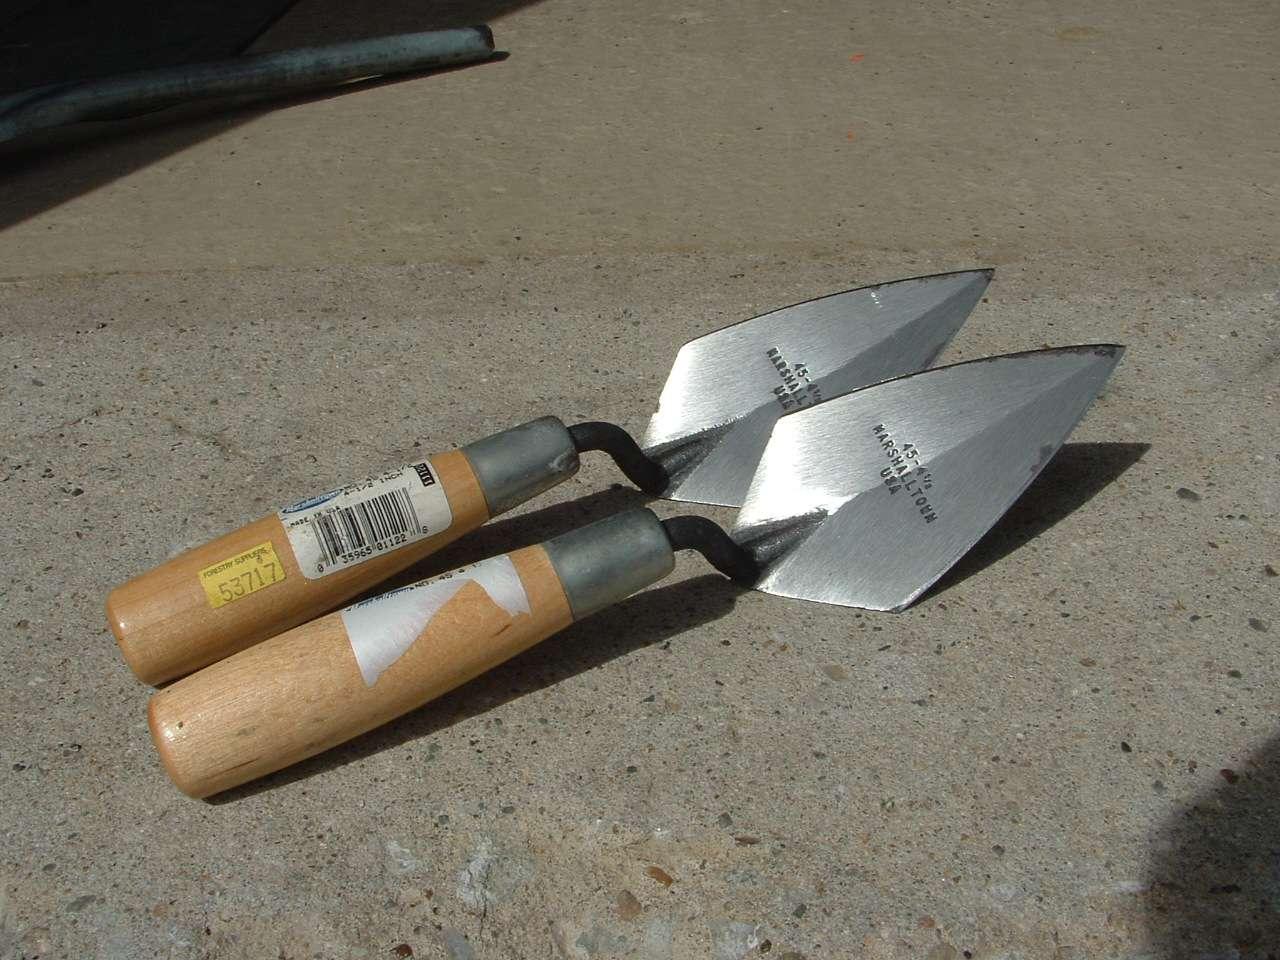 Two brand new, neatly sharpened Marshalltown trowels